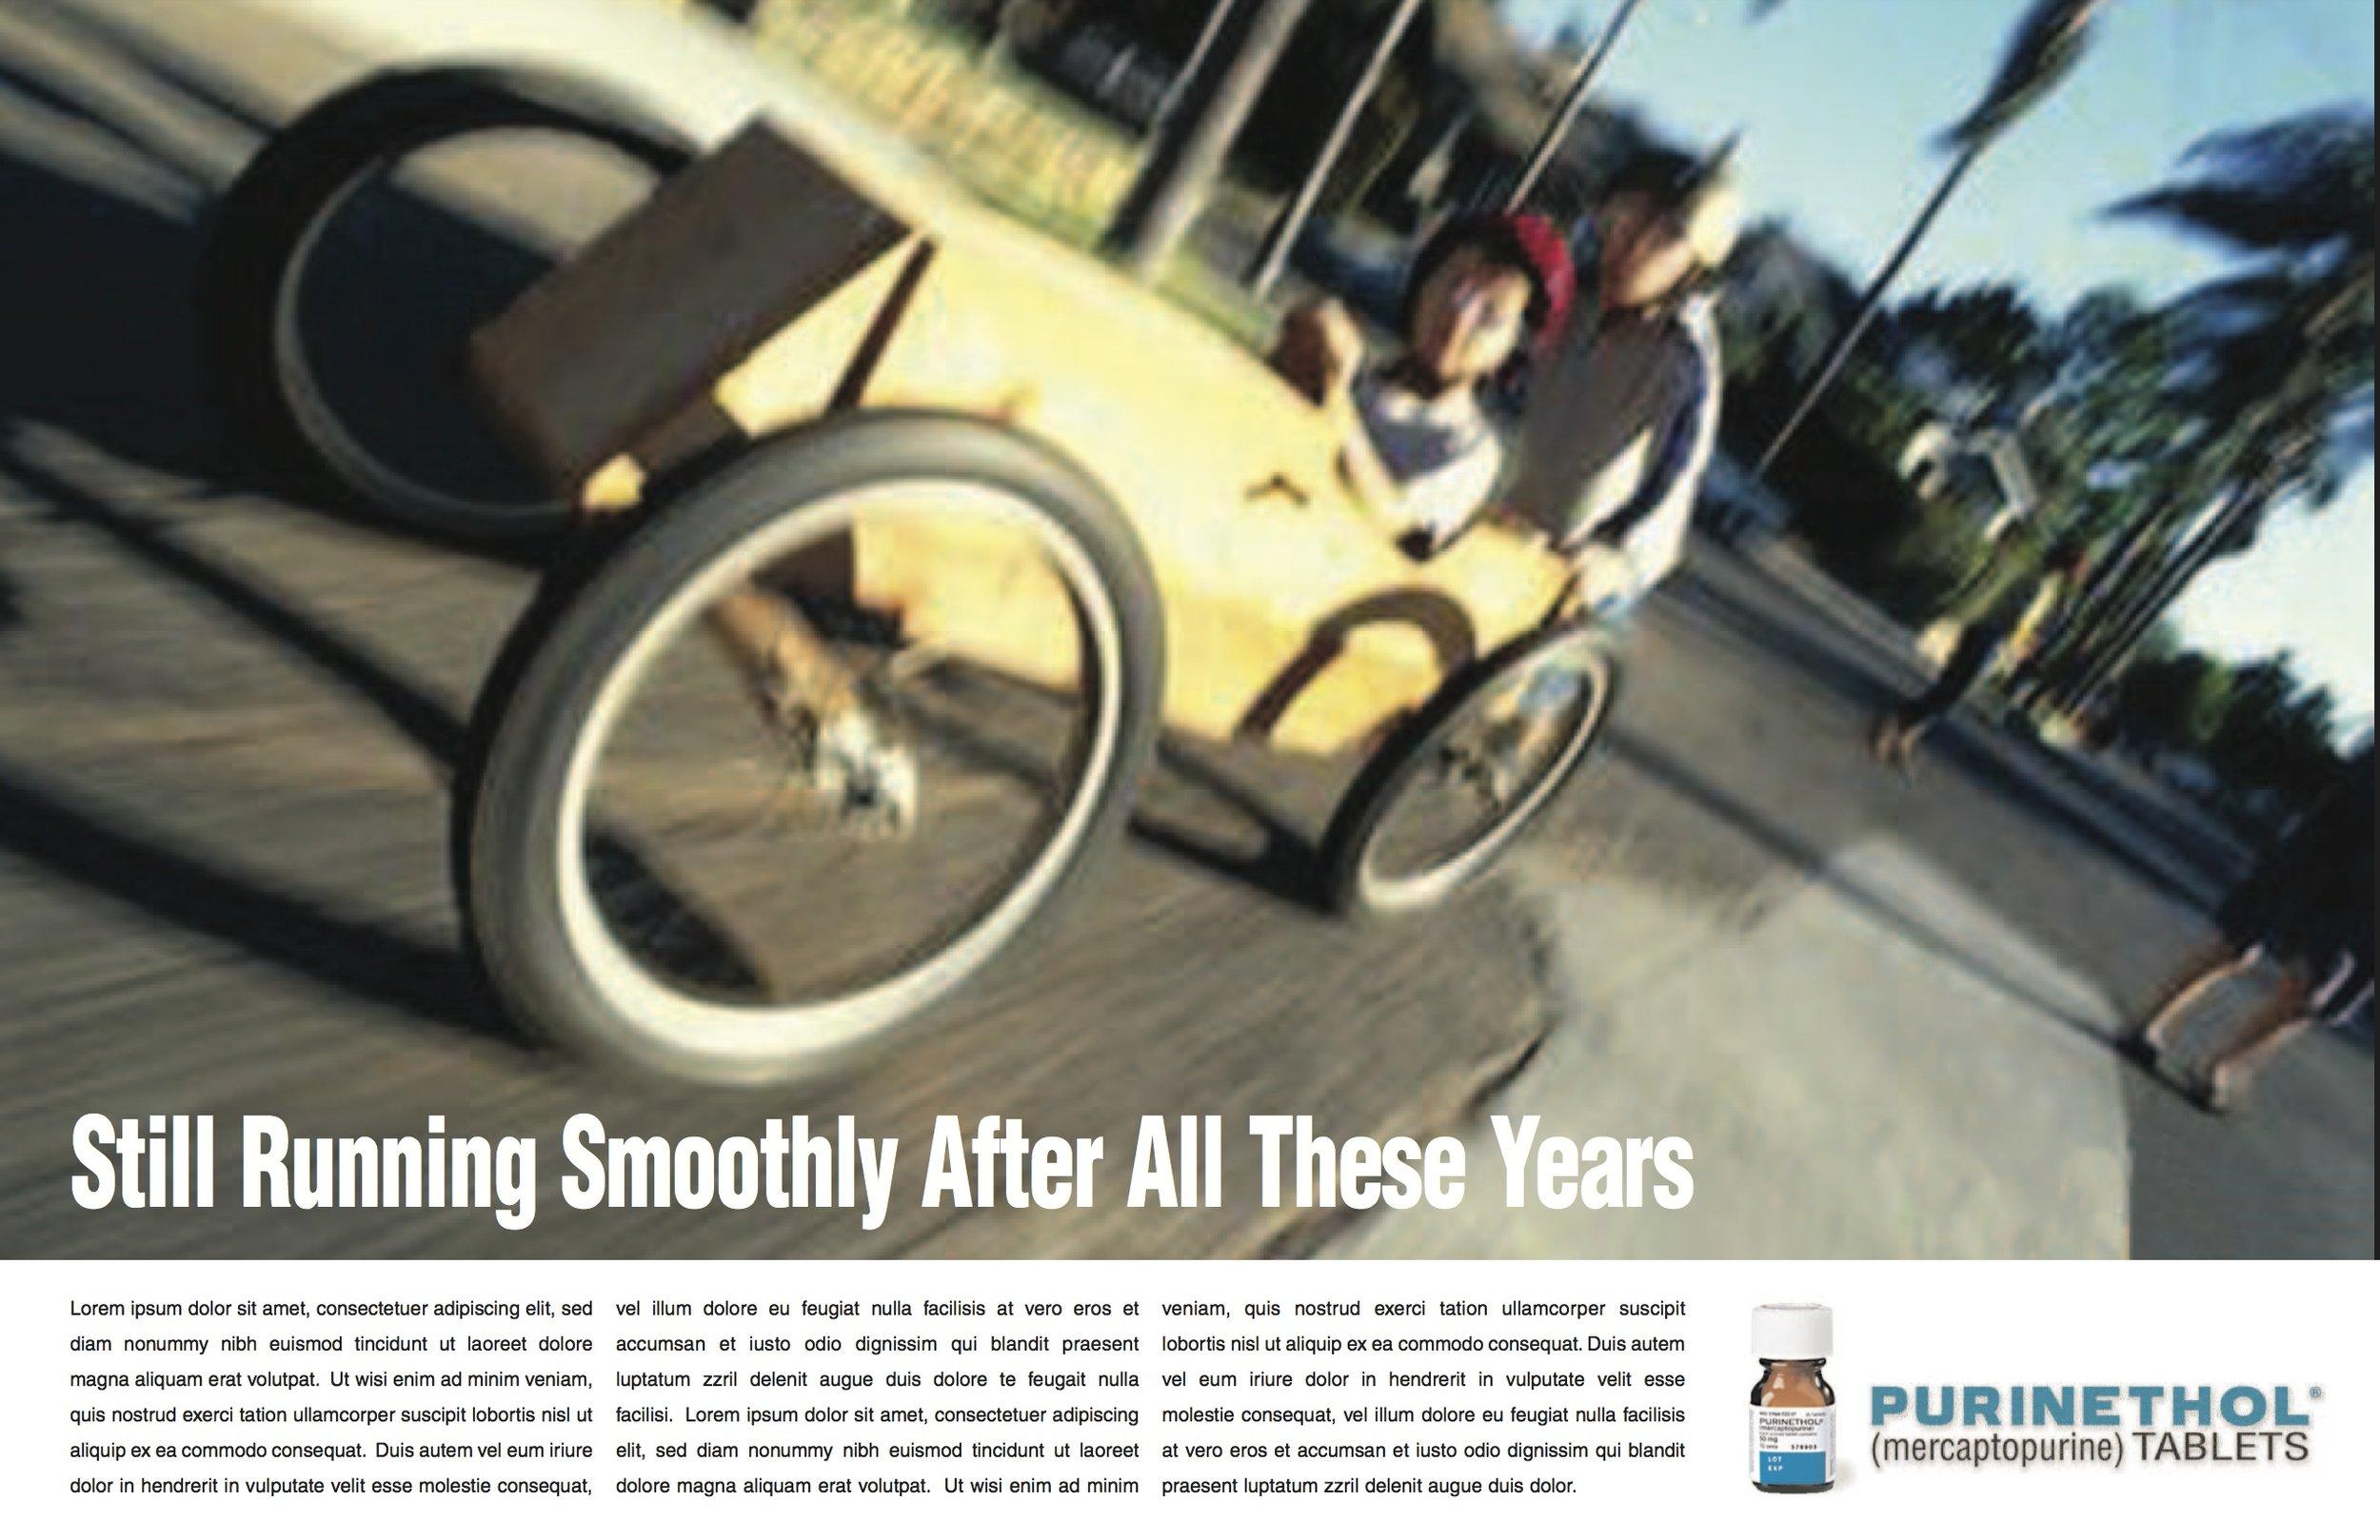 Purinethol-Comps-Racer.jpg